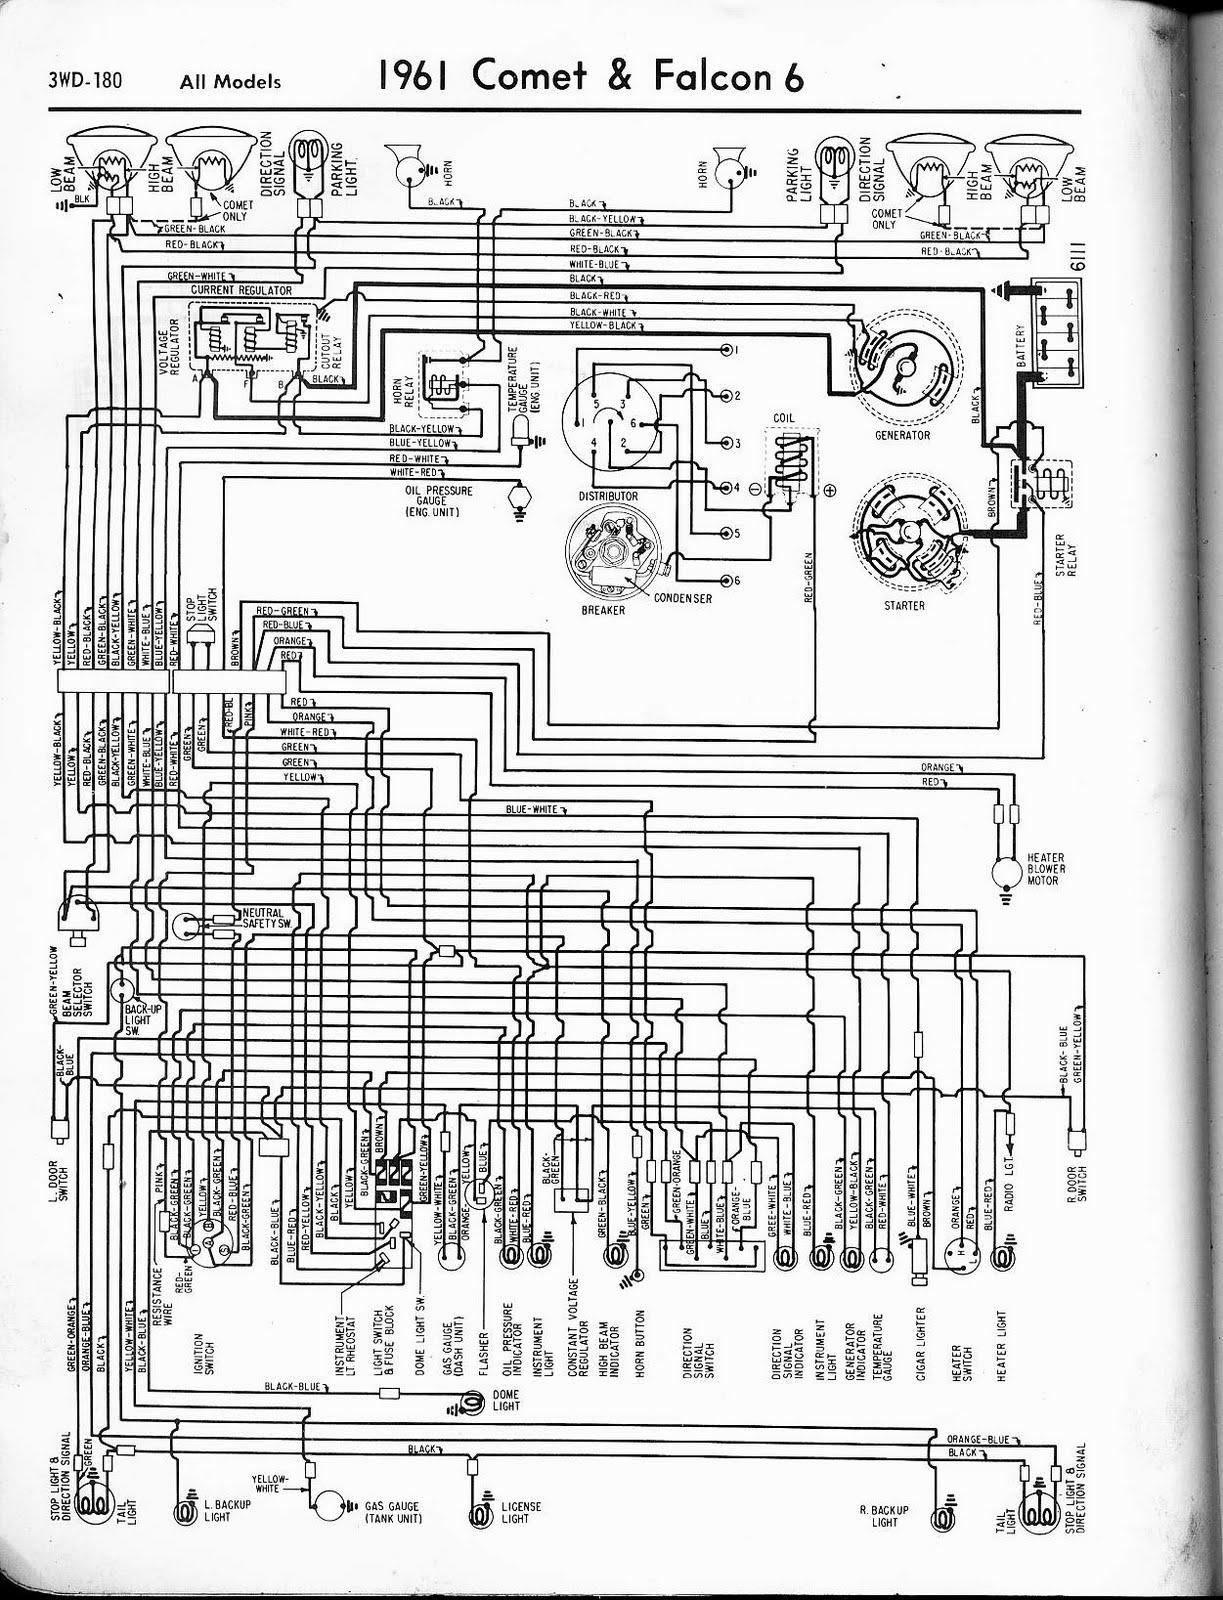 78 Ford Ranchero Wiring Diagram Jeep Cj5 Buick Regal 1978 Voltage Regulator Topsimagescom